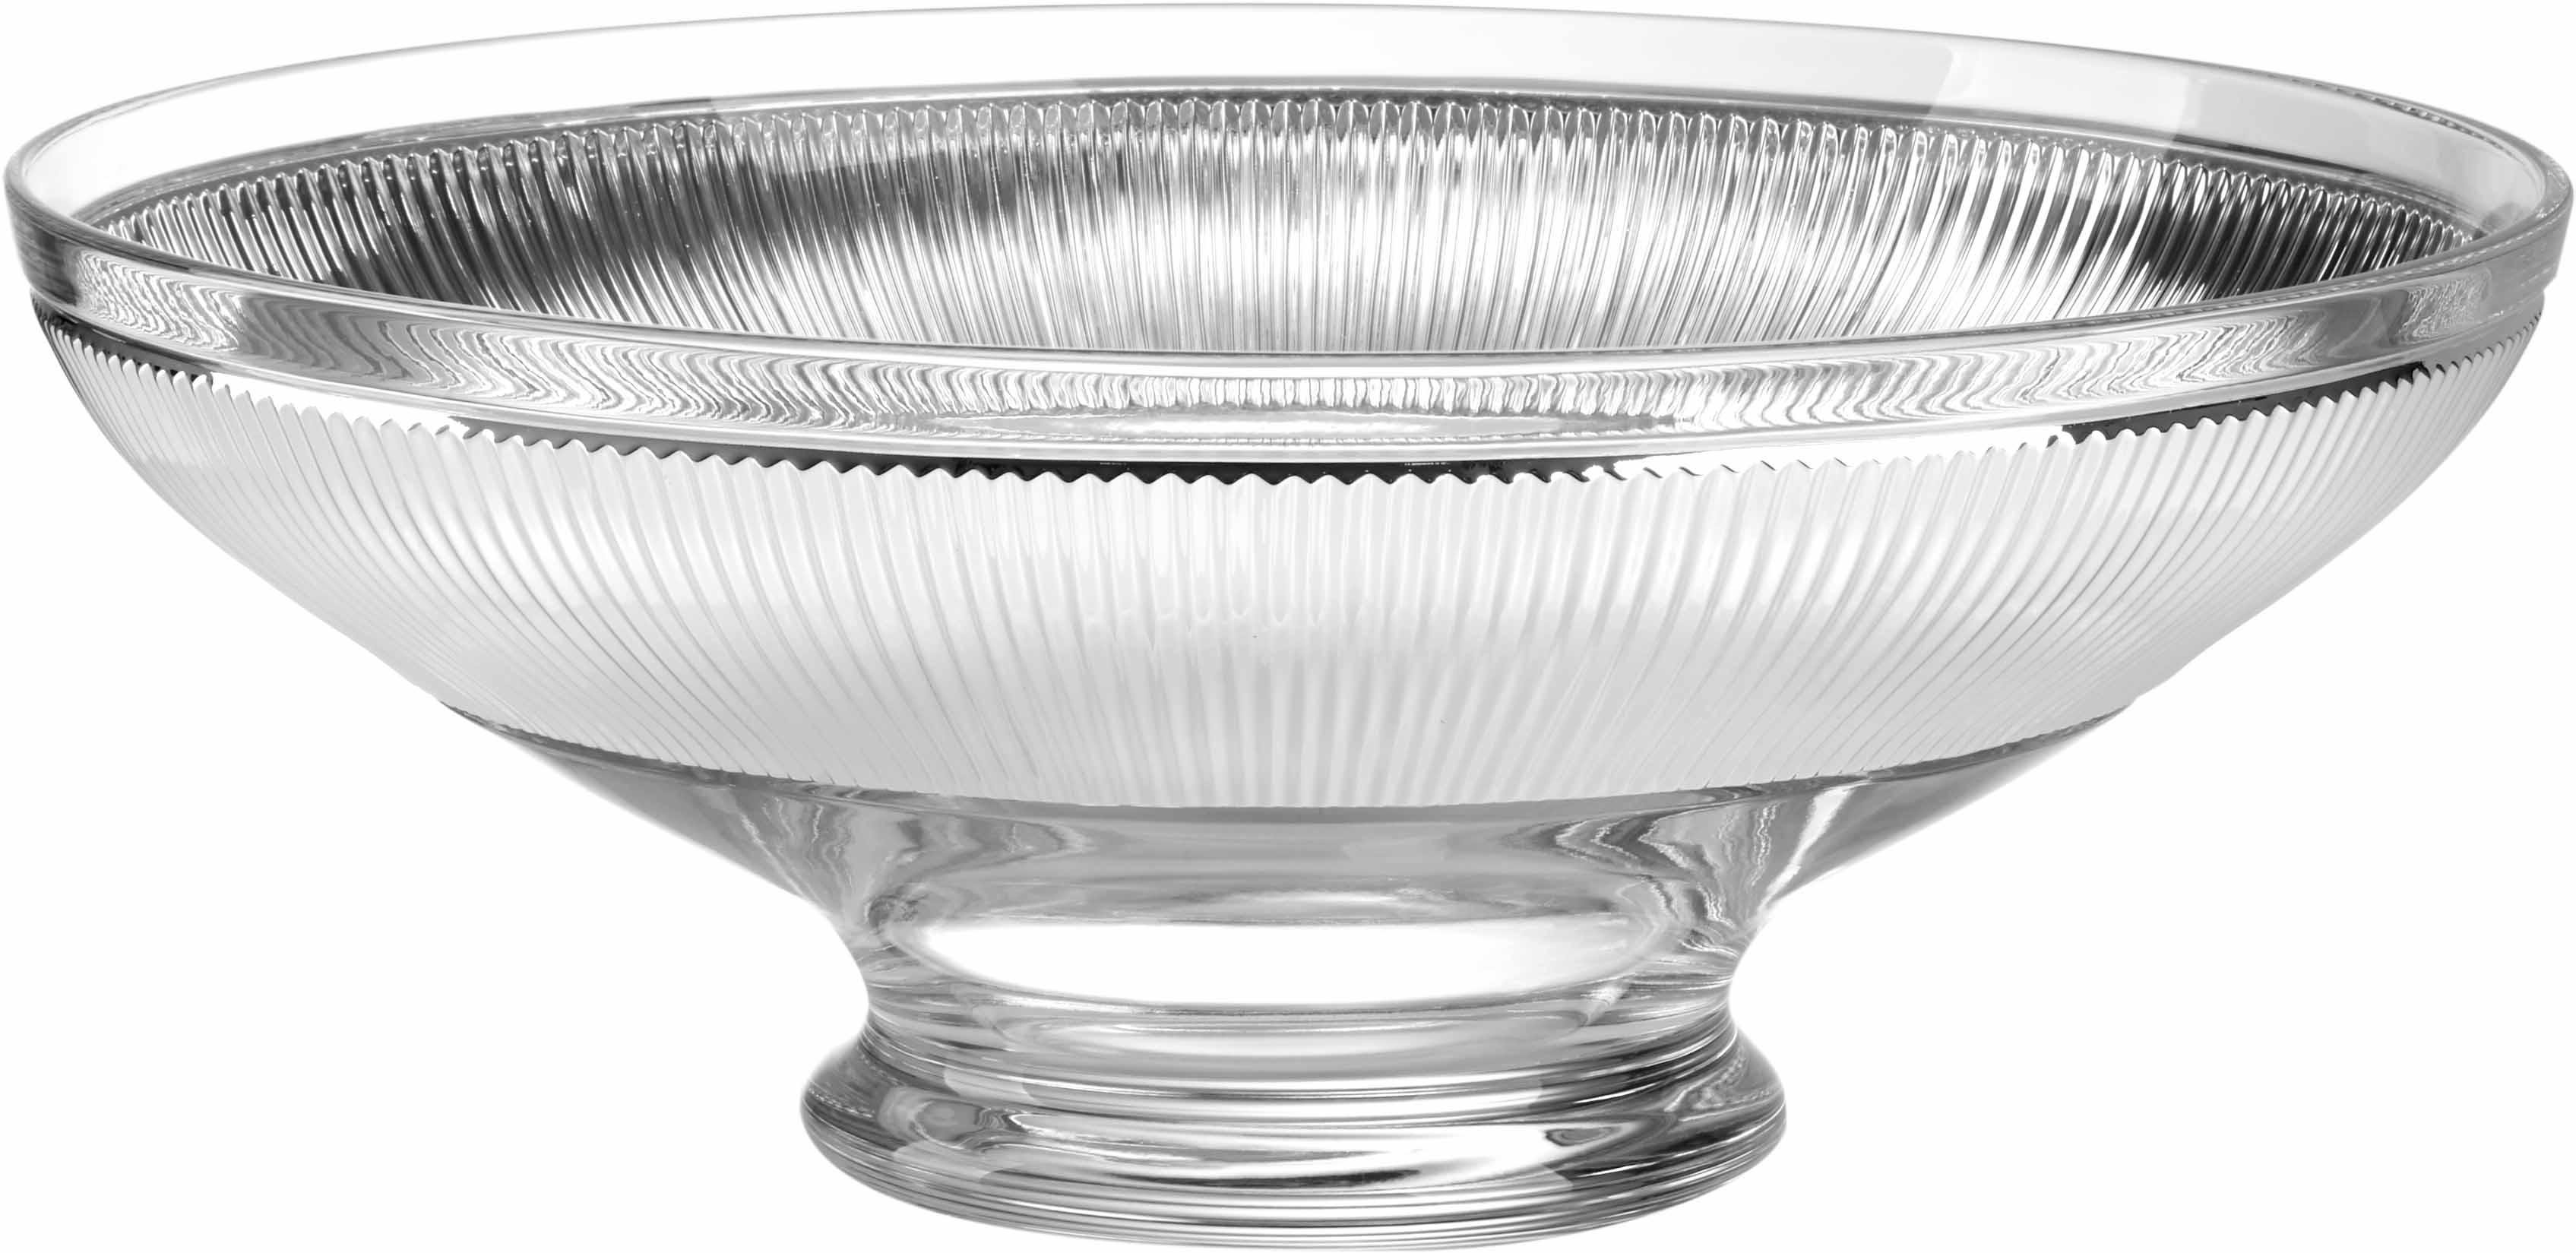 Centrotavola in cristallo inglese 40cm argento for Centrotavola in inglese